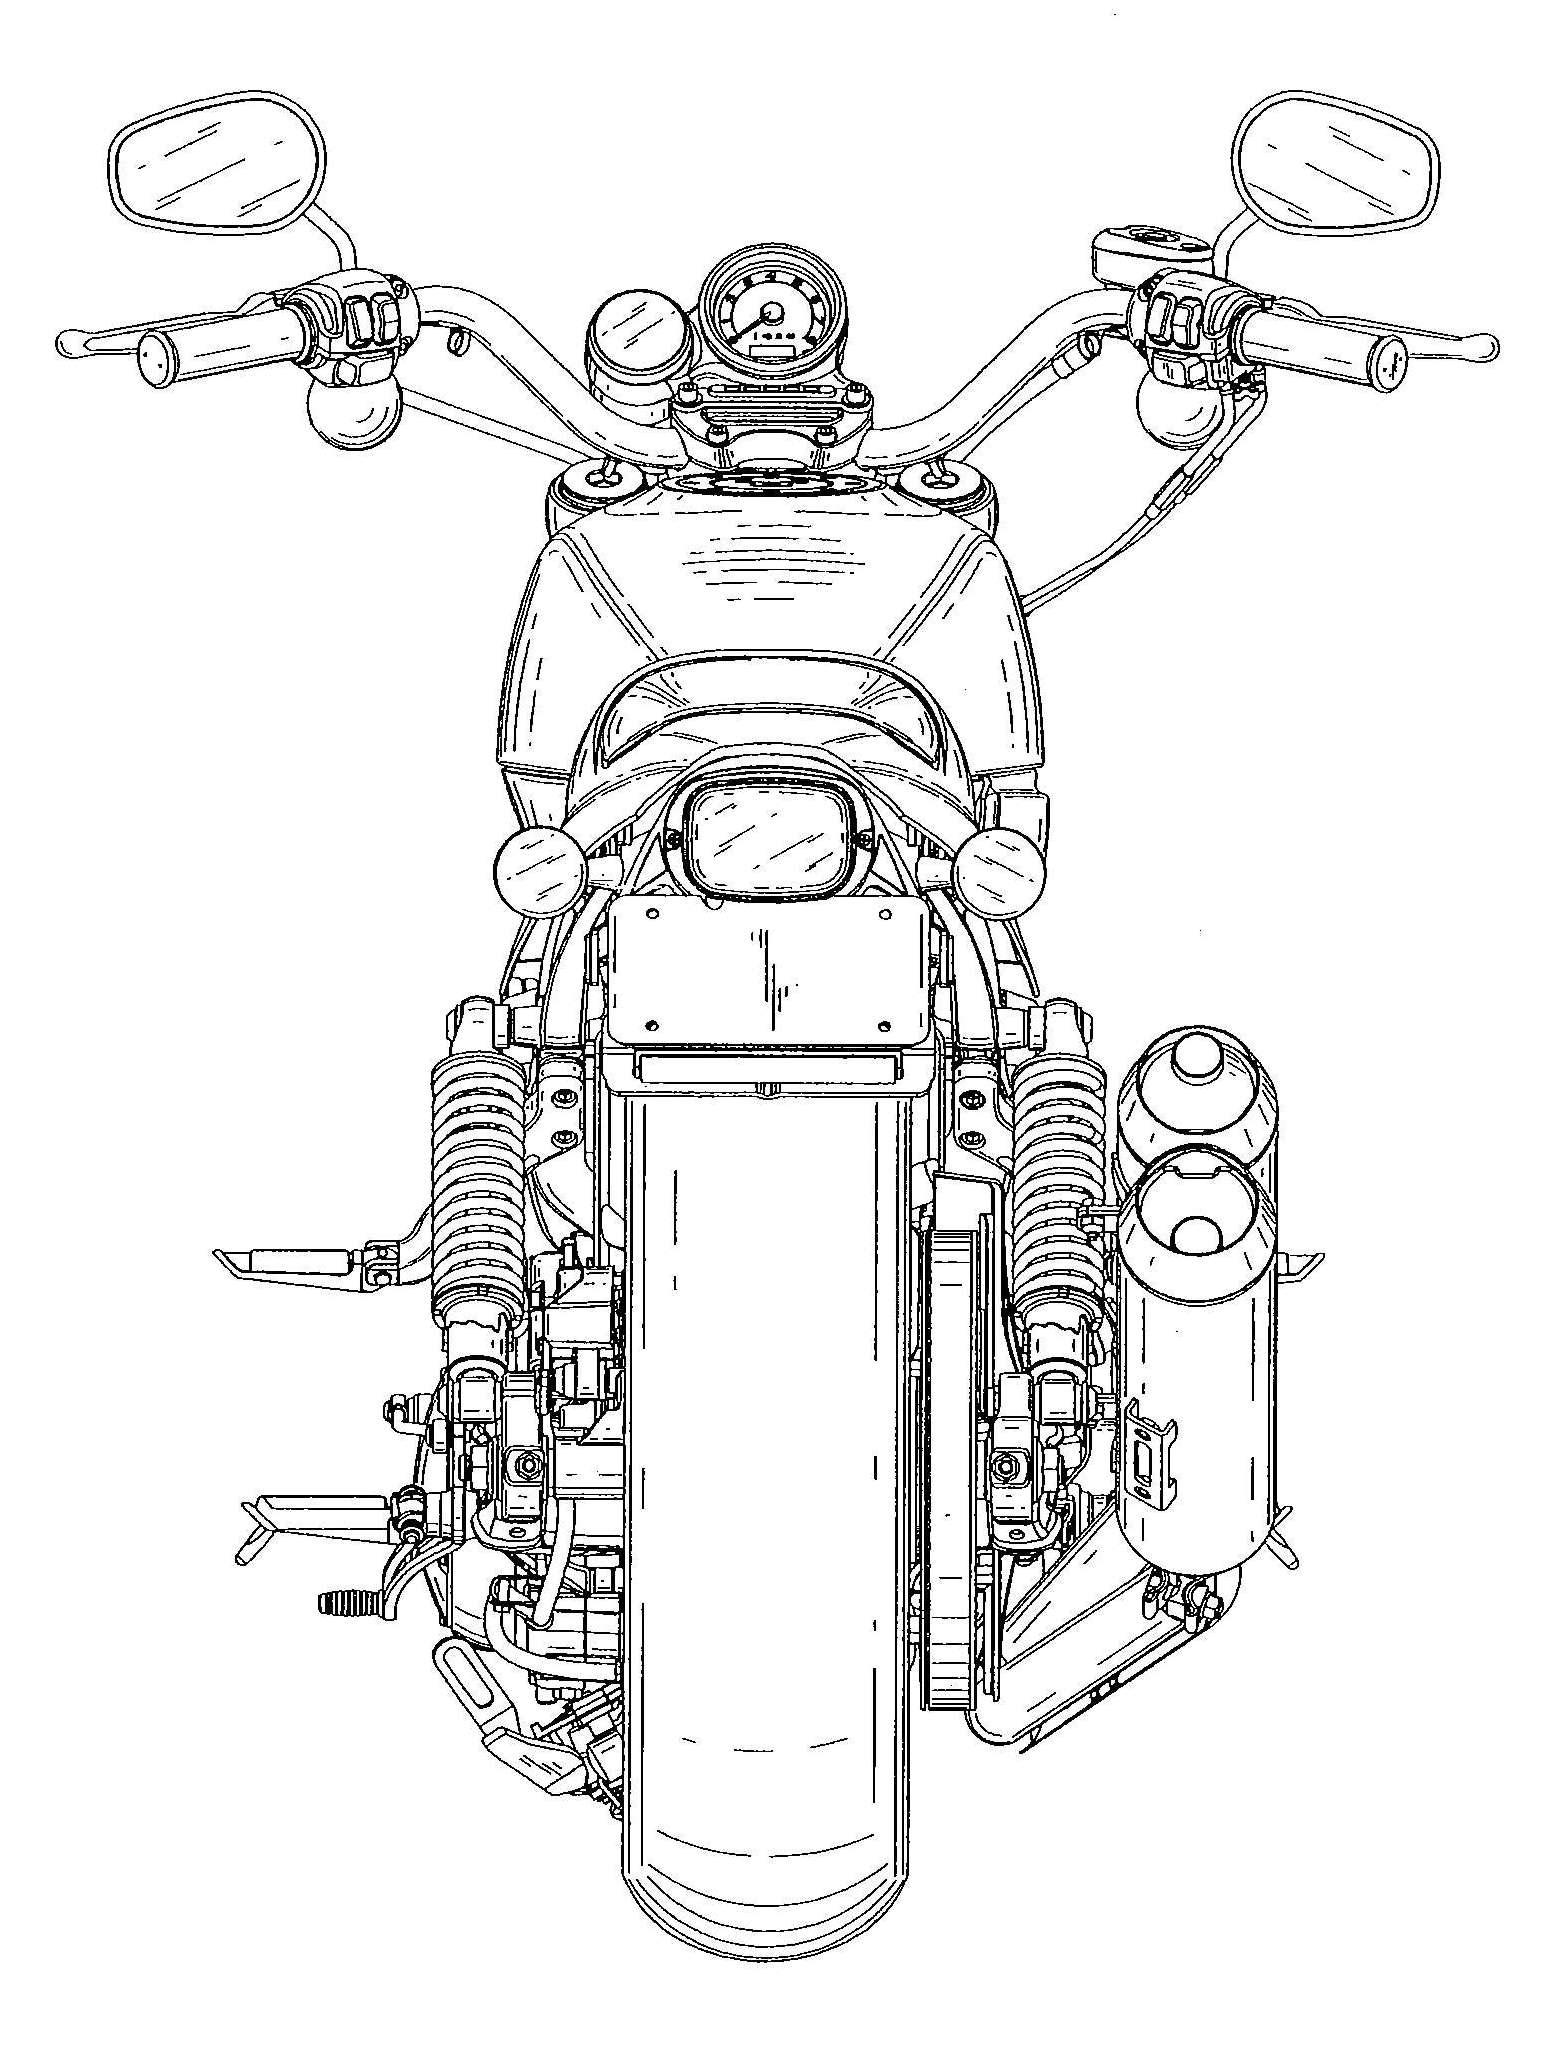 Harley Davidson Road King Manual Online